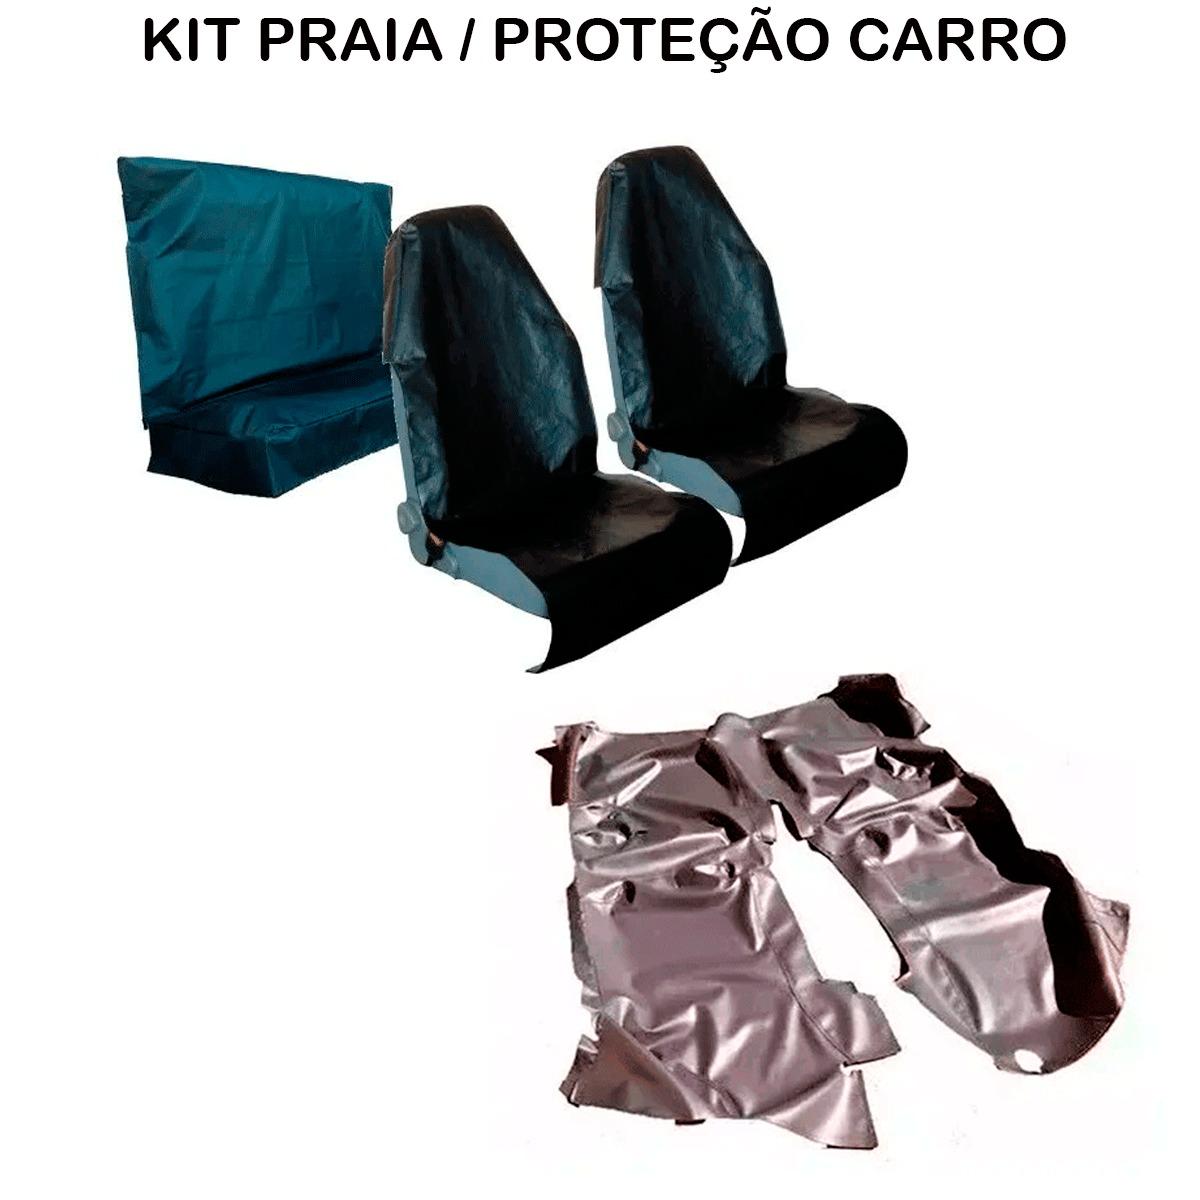 Tapete Em Vinil Volkswagen Bora + Capa Banco Protecao Banco Areia Suor Academia